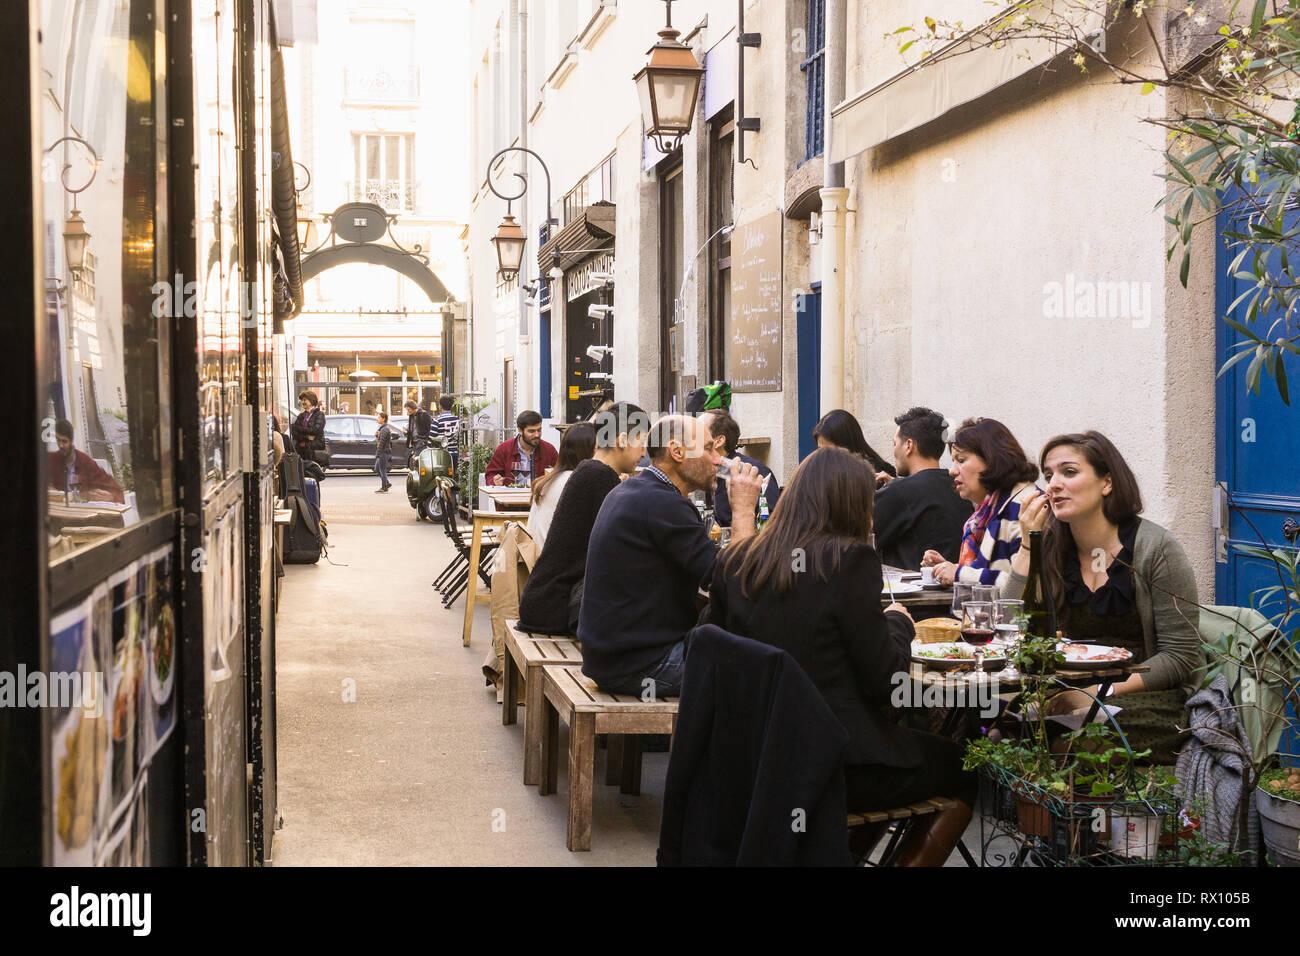 Paris food market - People having lunch break in eateries at the Marche des Enfants Rouges in the Marais district of Paris, France. Stock Photo